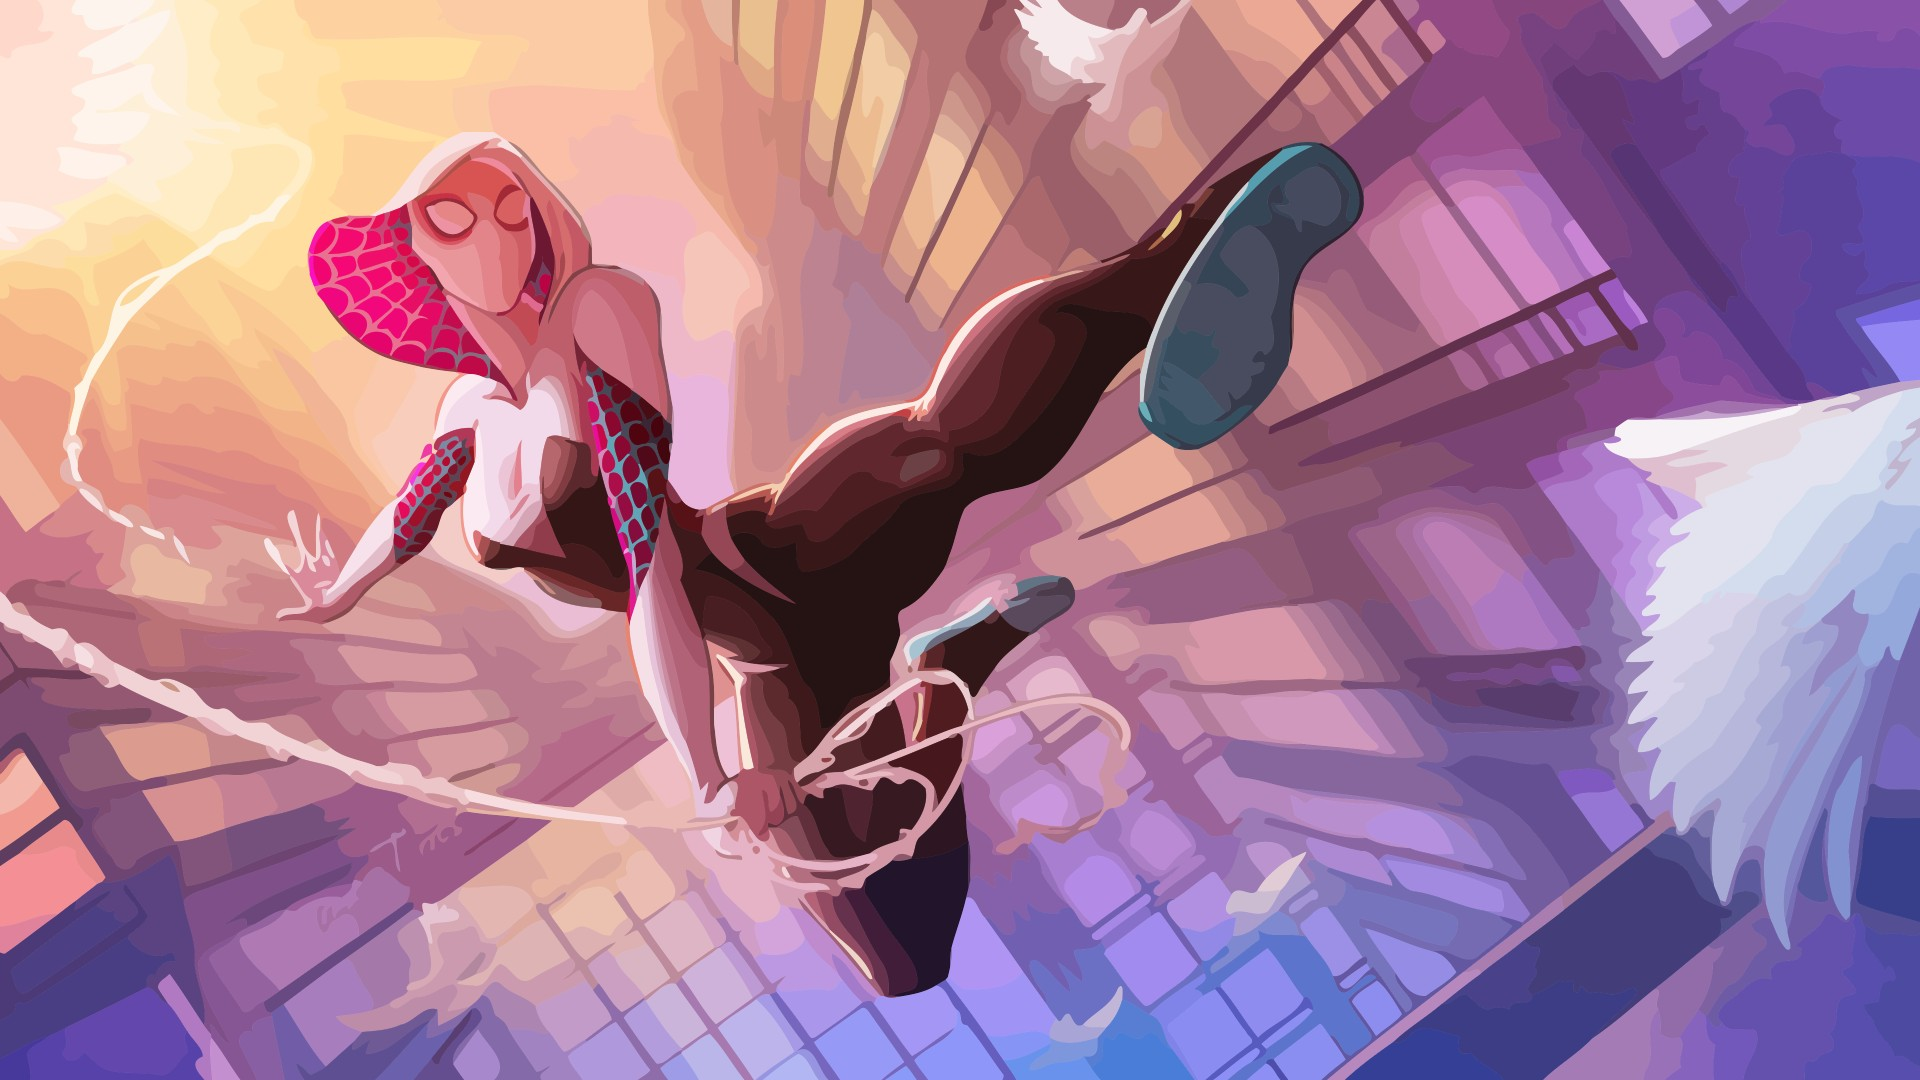 Spider Gwen wallpaper ·① Download free cool High ...